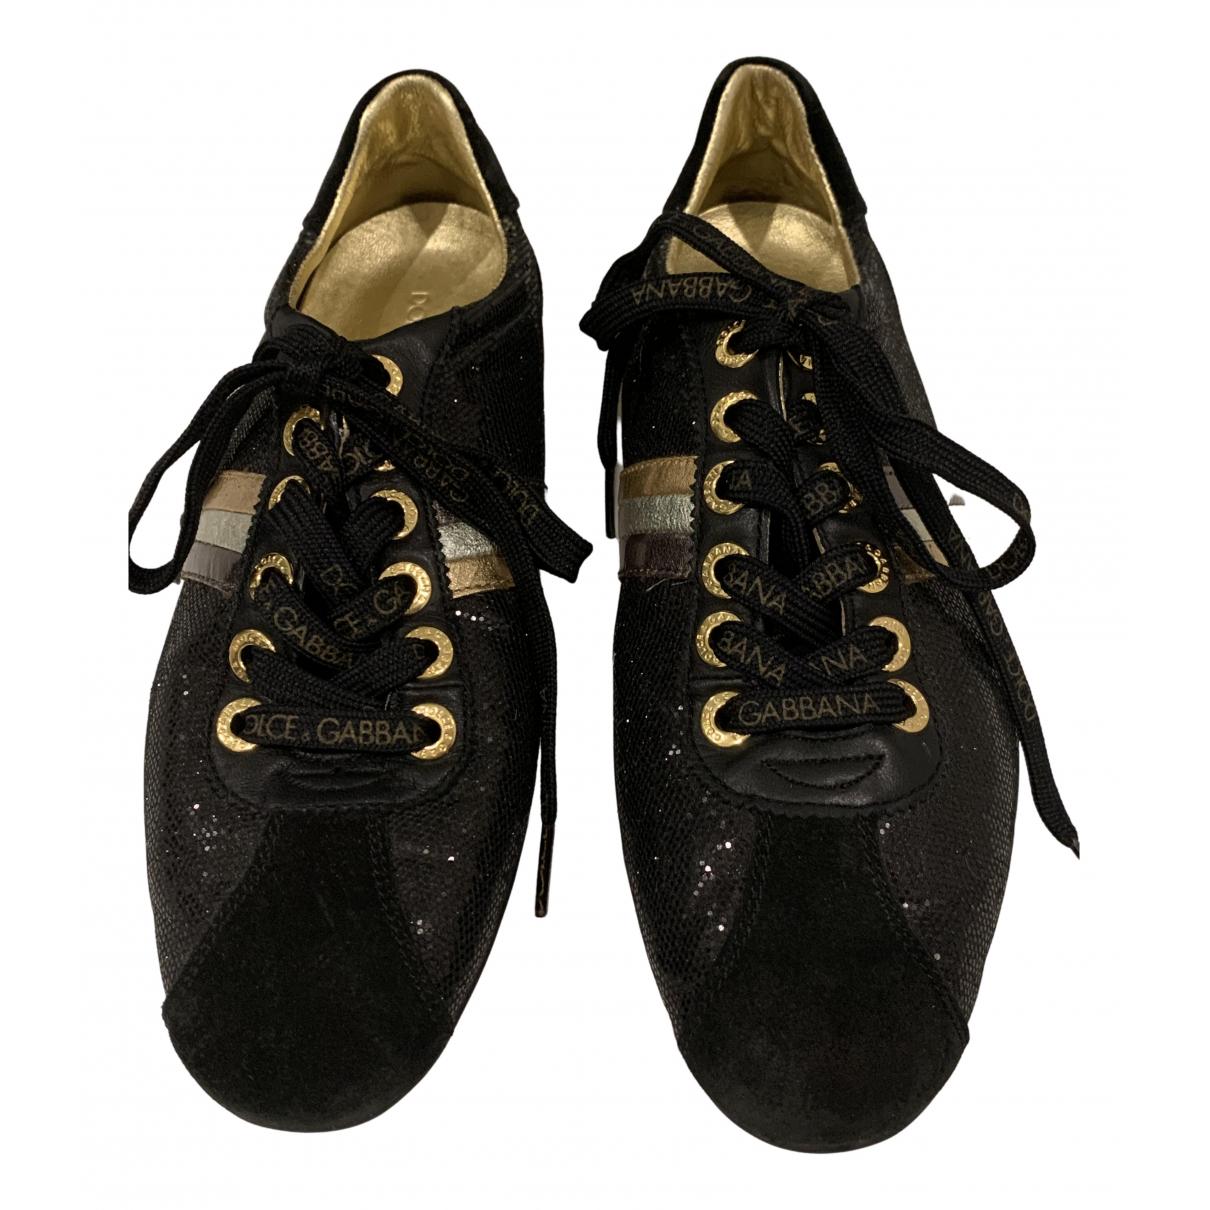 Dolce & Gabbana \N Sneakers in  Schwarz Leinen